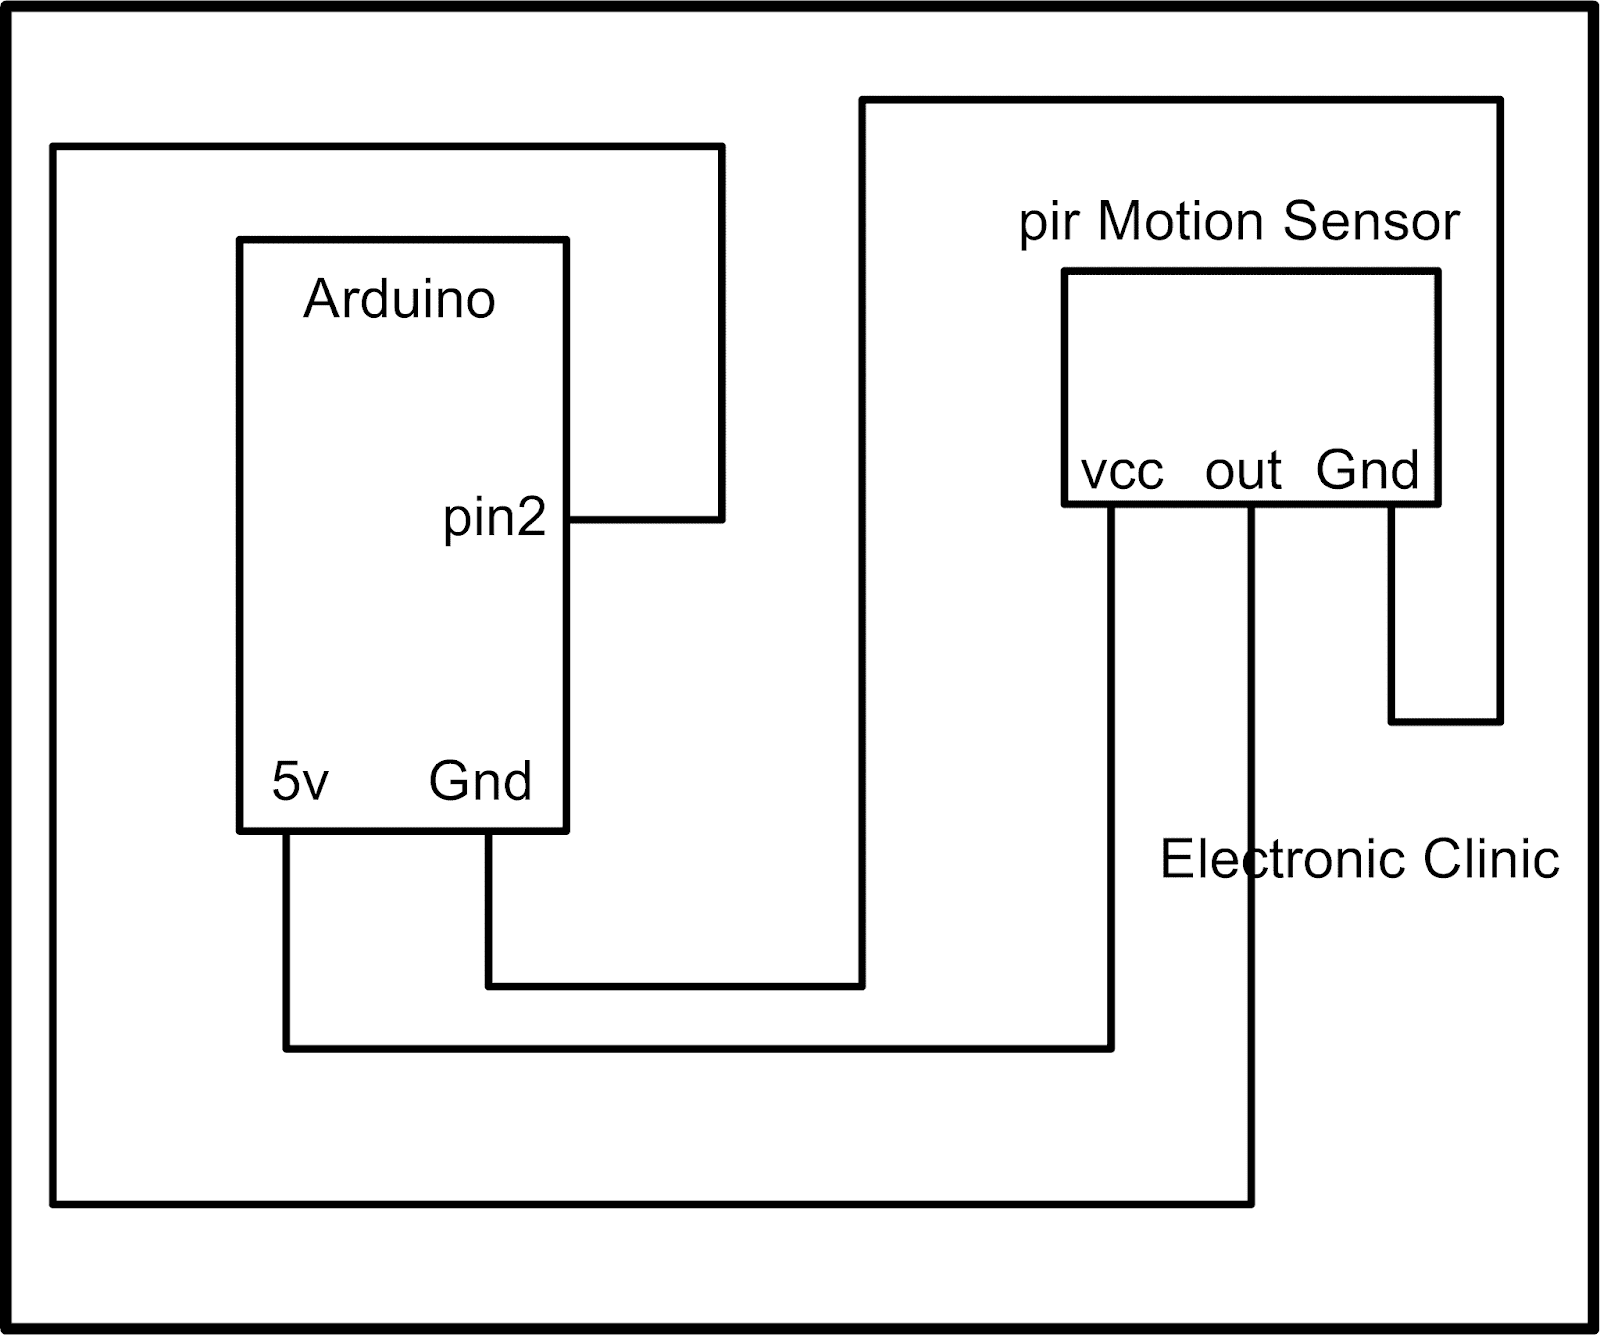 Arduino Plc Scada Solidworks Image Processing Robotics Power Pirsensorbasedsecurityalarmcircuitdiagramjpg Interfacing With Mega Circuit Diagram